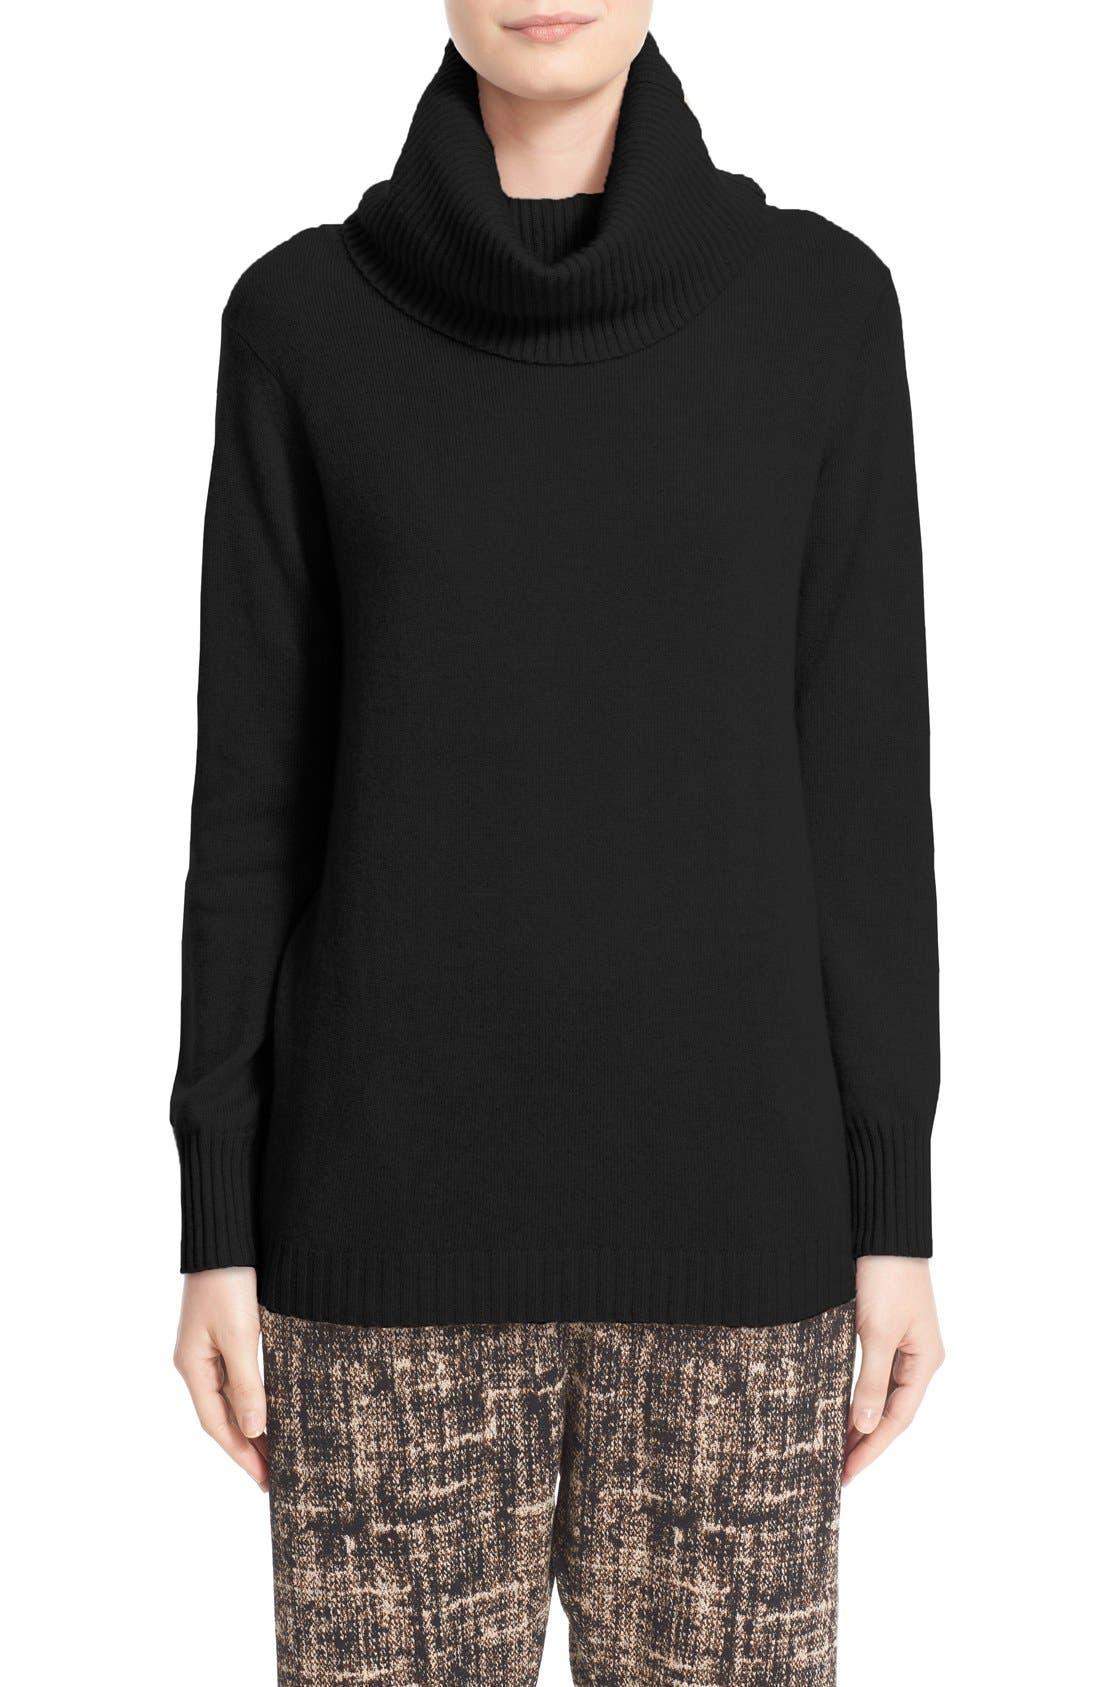 Zero + Maria Cornejo 'Asha' Cashmere & Wool Turtleneck Sweater